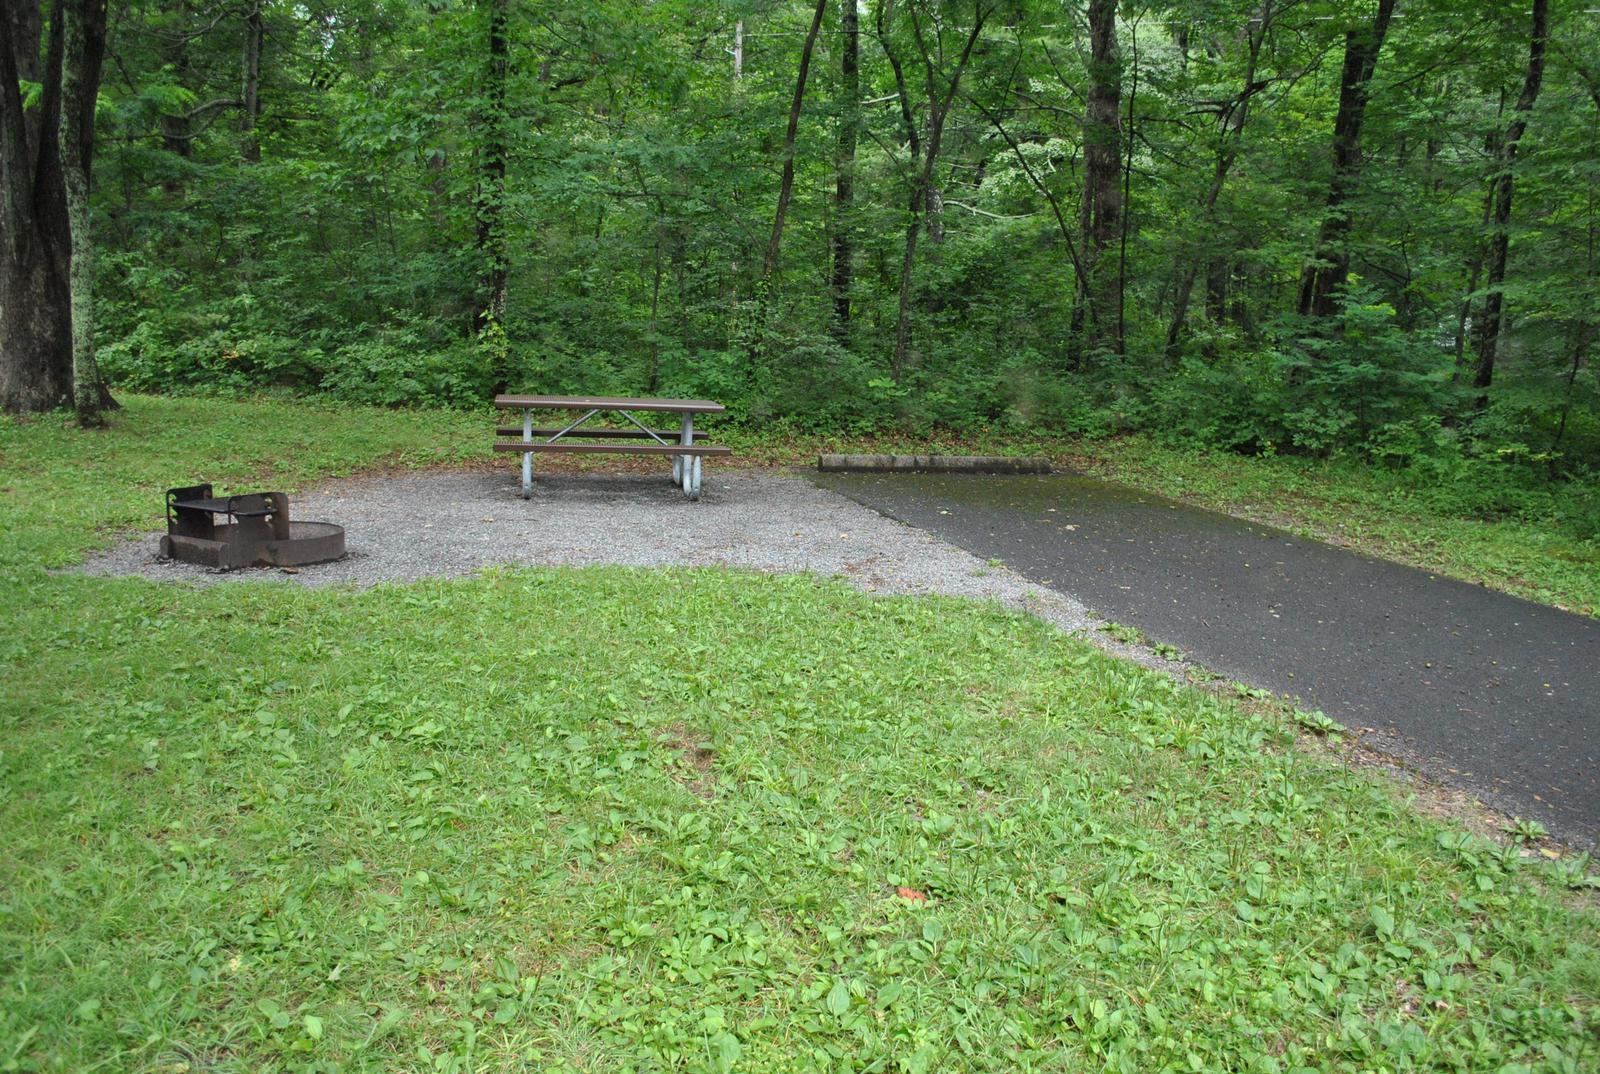 Mathews Arm Campground – Site A109